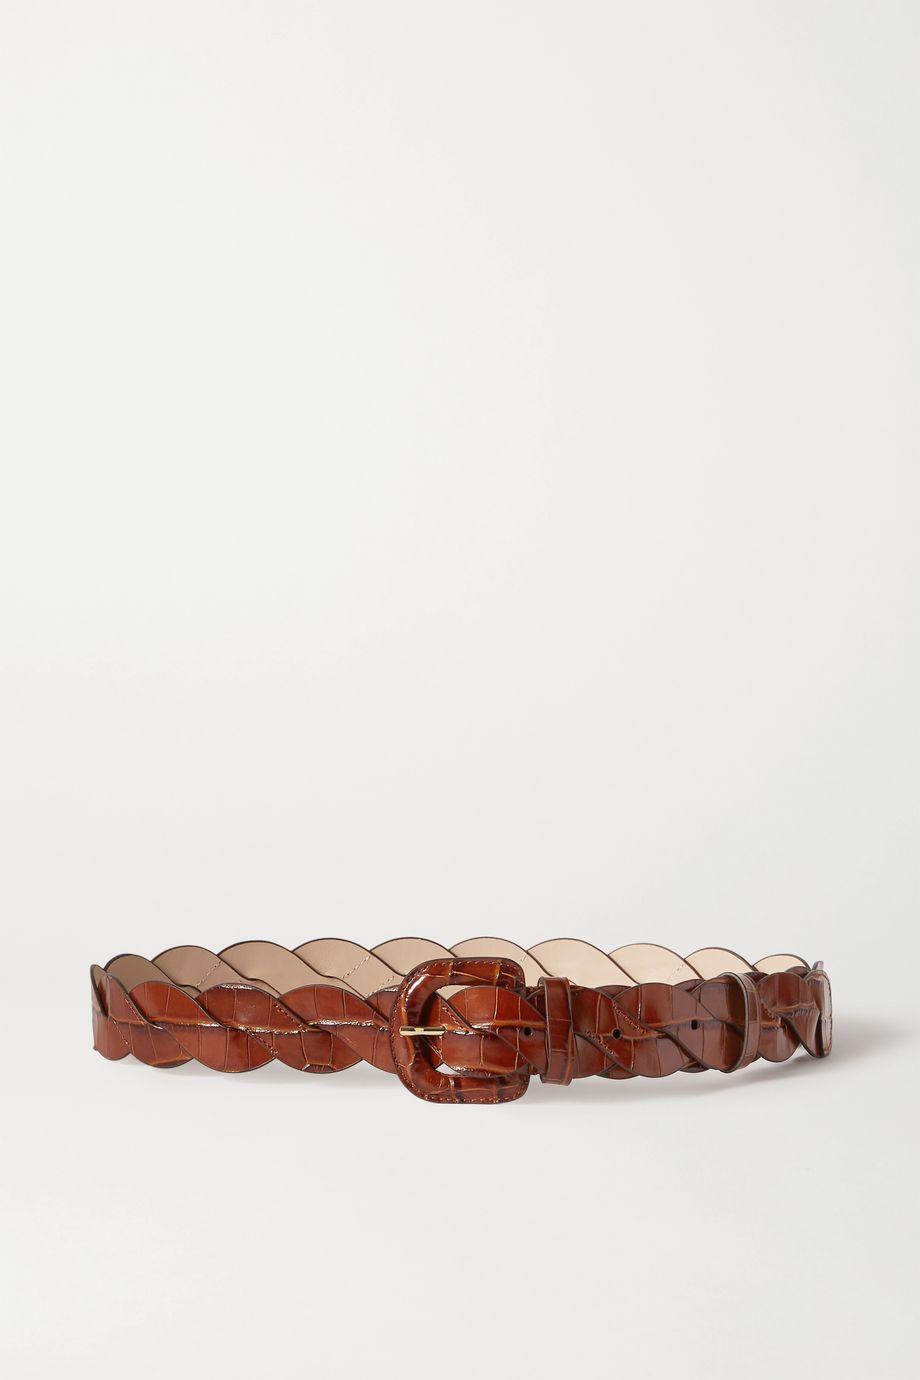 Loeffler Randall Deidre braided croc-effect leather belt